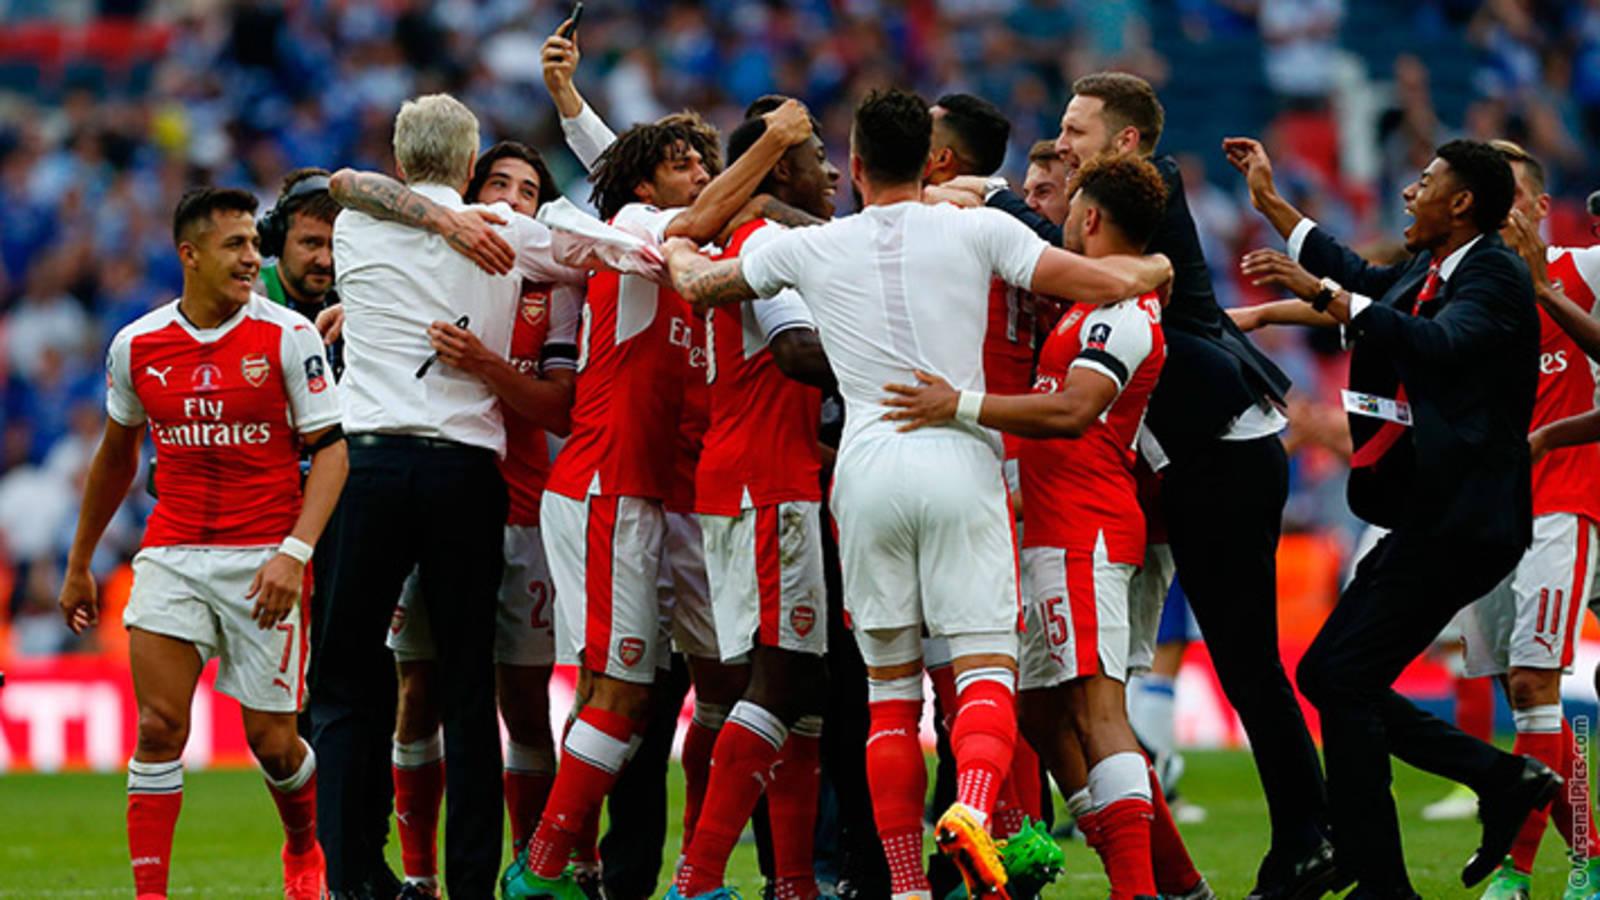 Arsenal 2 - 1 Chelsea - Match Report | Arsenal.com